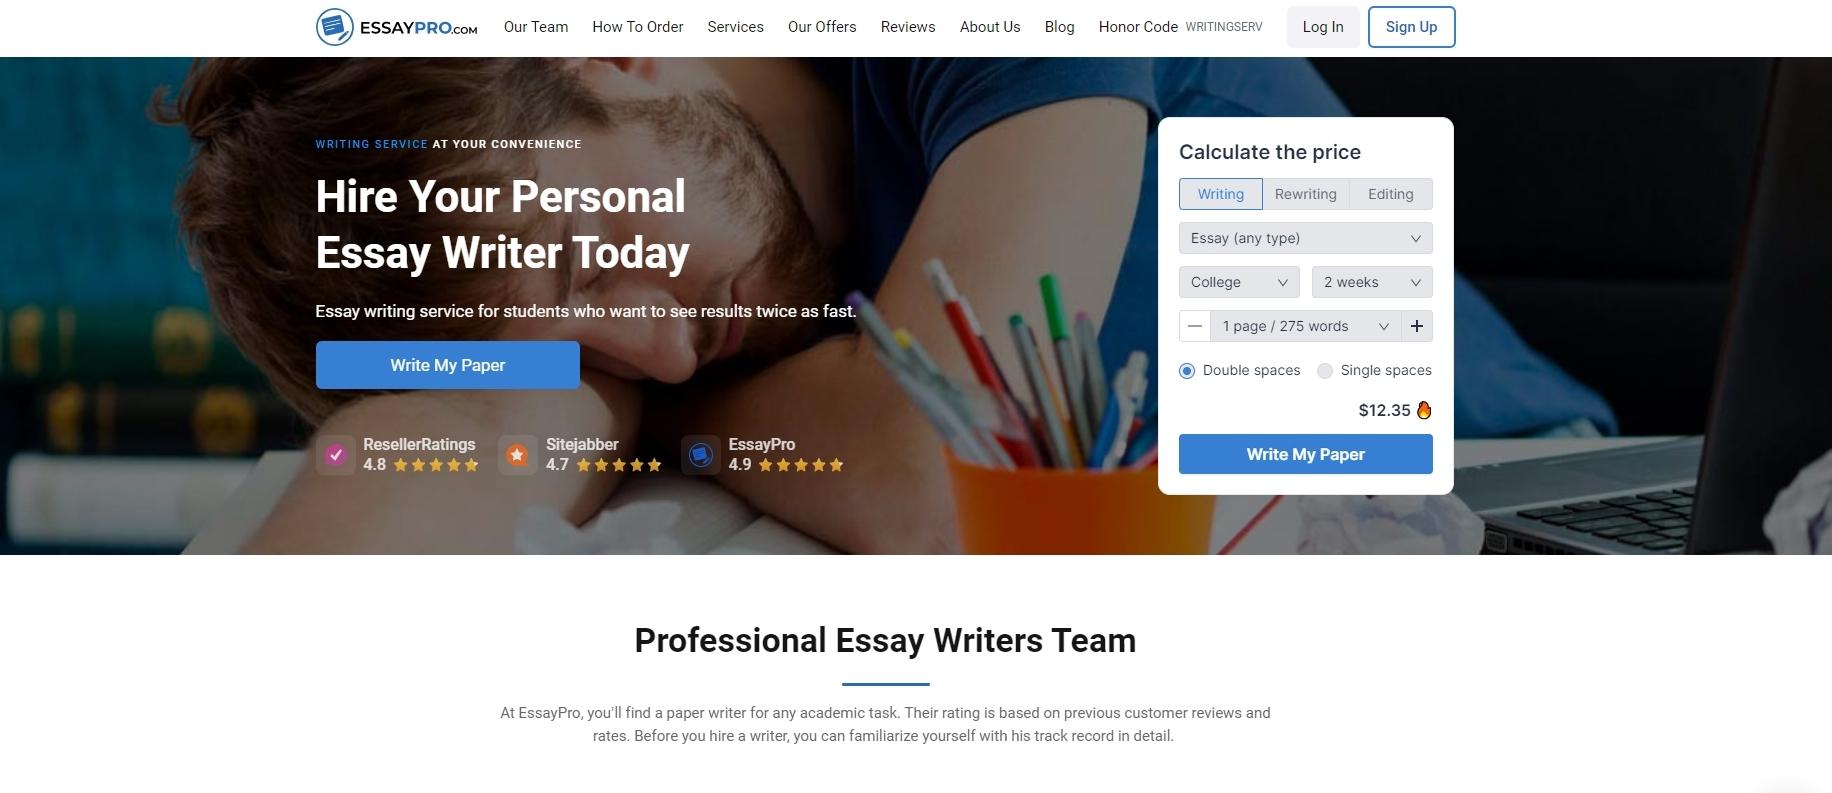 Essay Pro